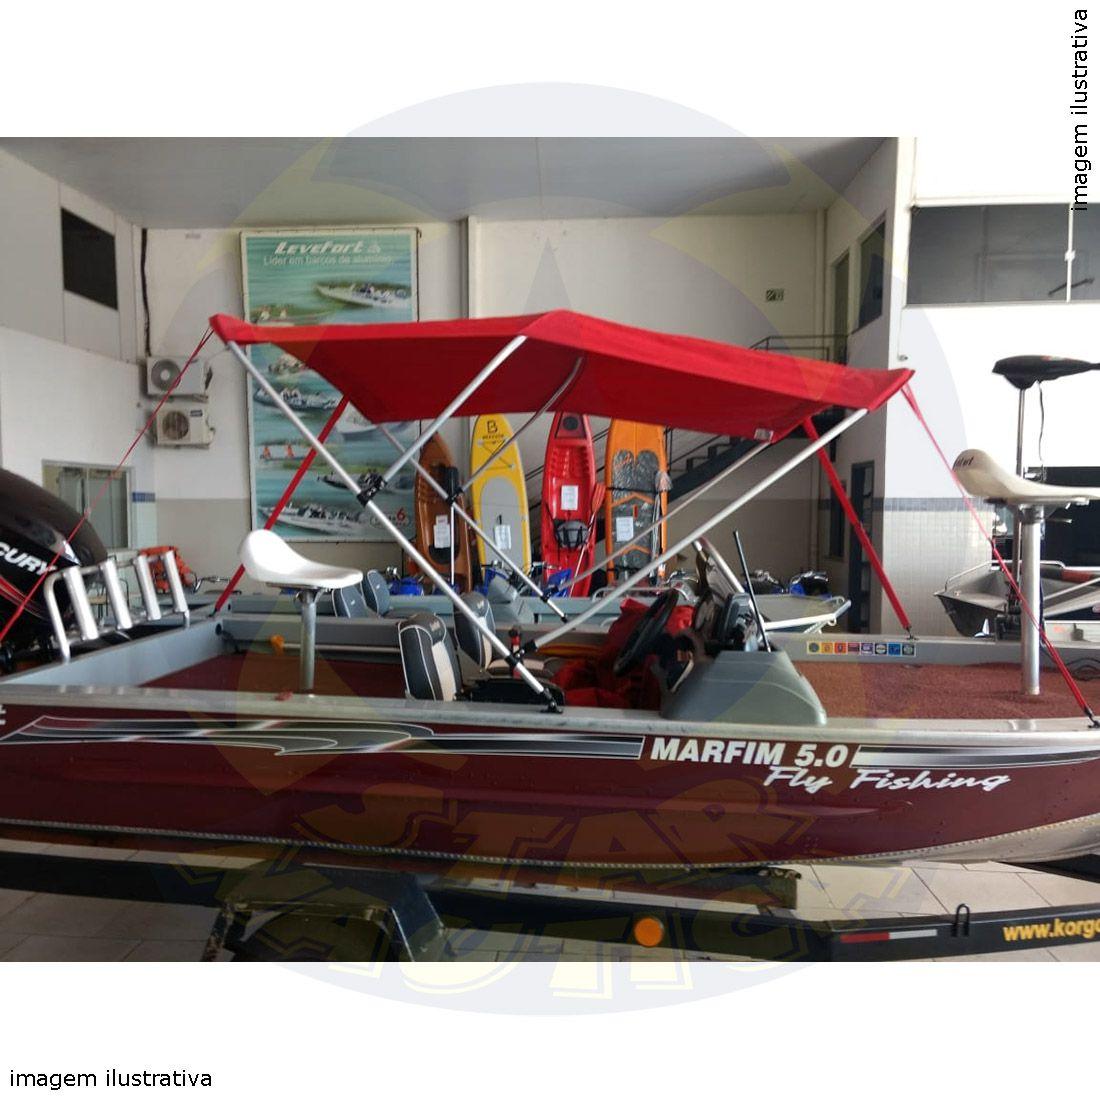 Capota Toldo Lancha Marfim 6.0 Freestyle Acrílica 3 Arcos Tubo 7/8